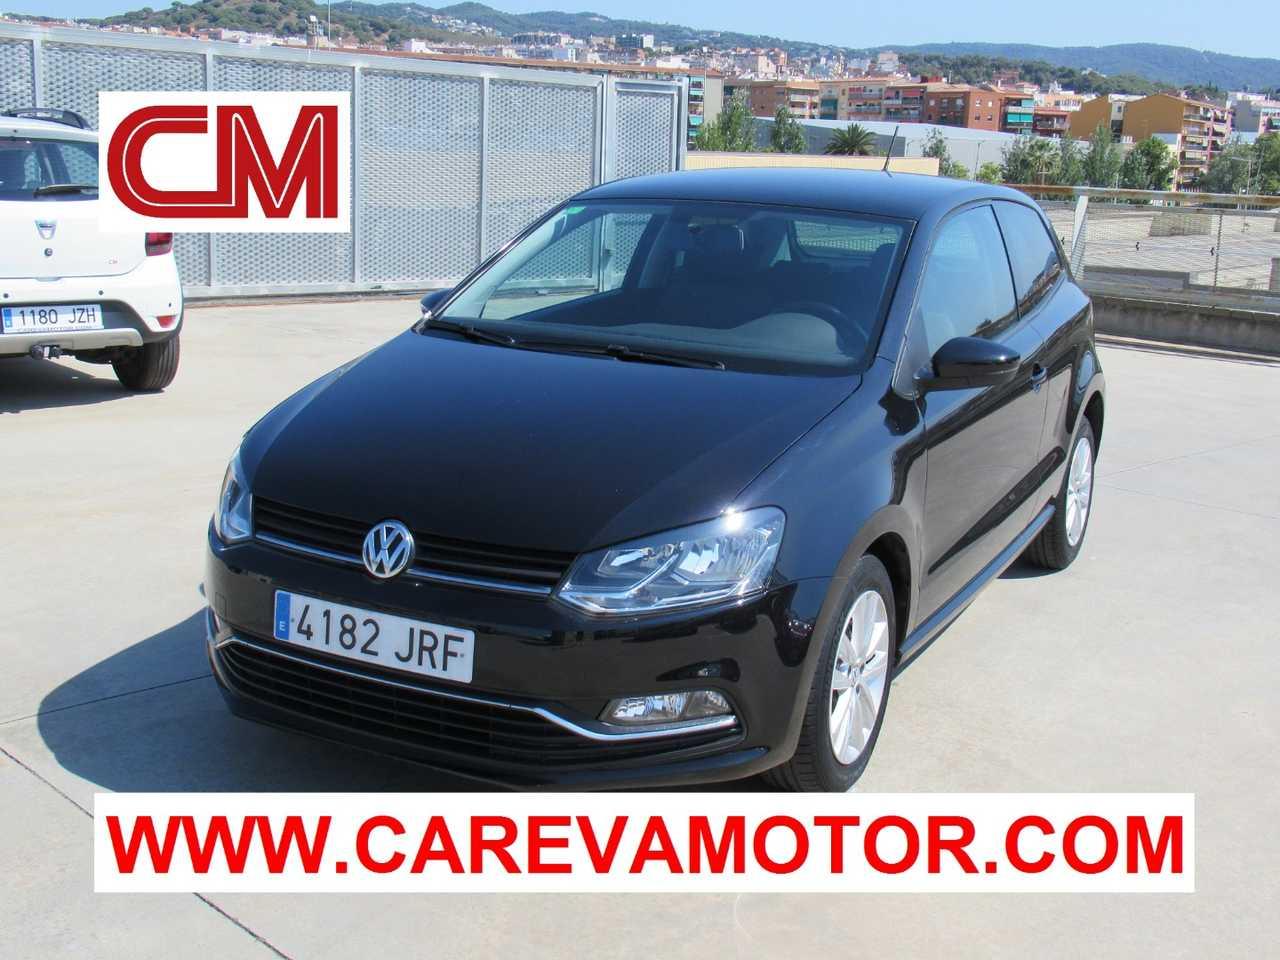 Volkswagen Polo 1.4 TDI 90CV AMBITION 3P   - Foto 1